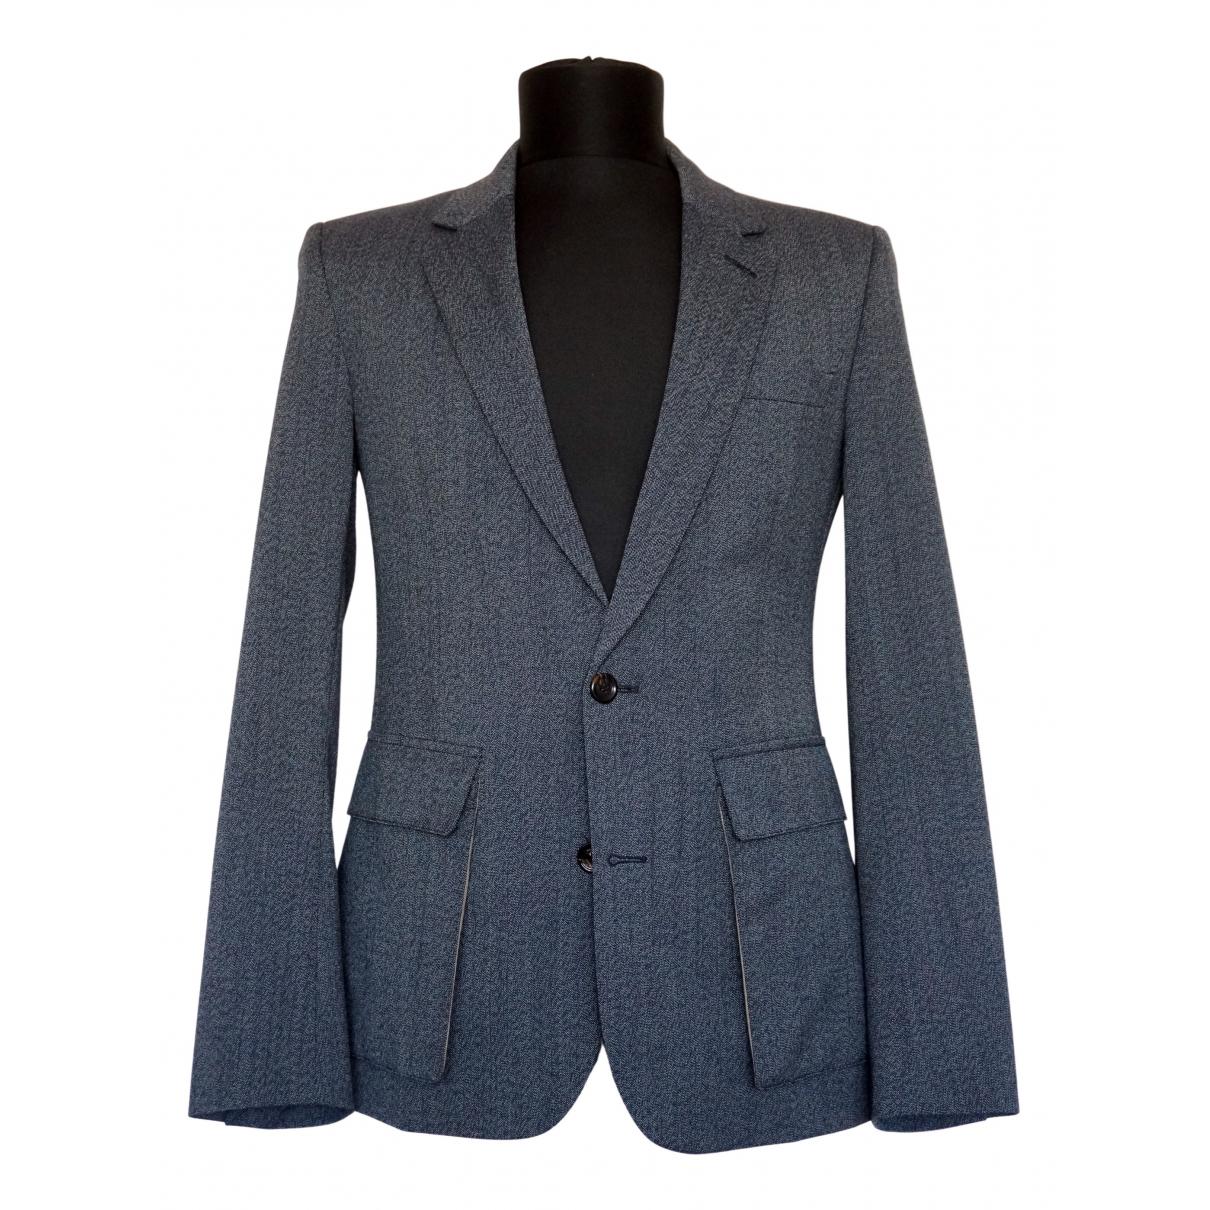 Maison Martin Margiela N Grey Wool jacket  for Men 44 IT